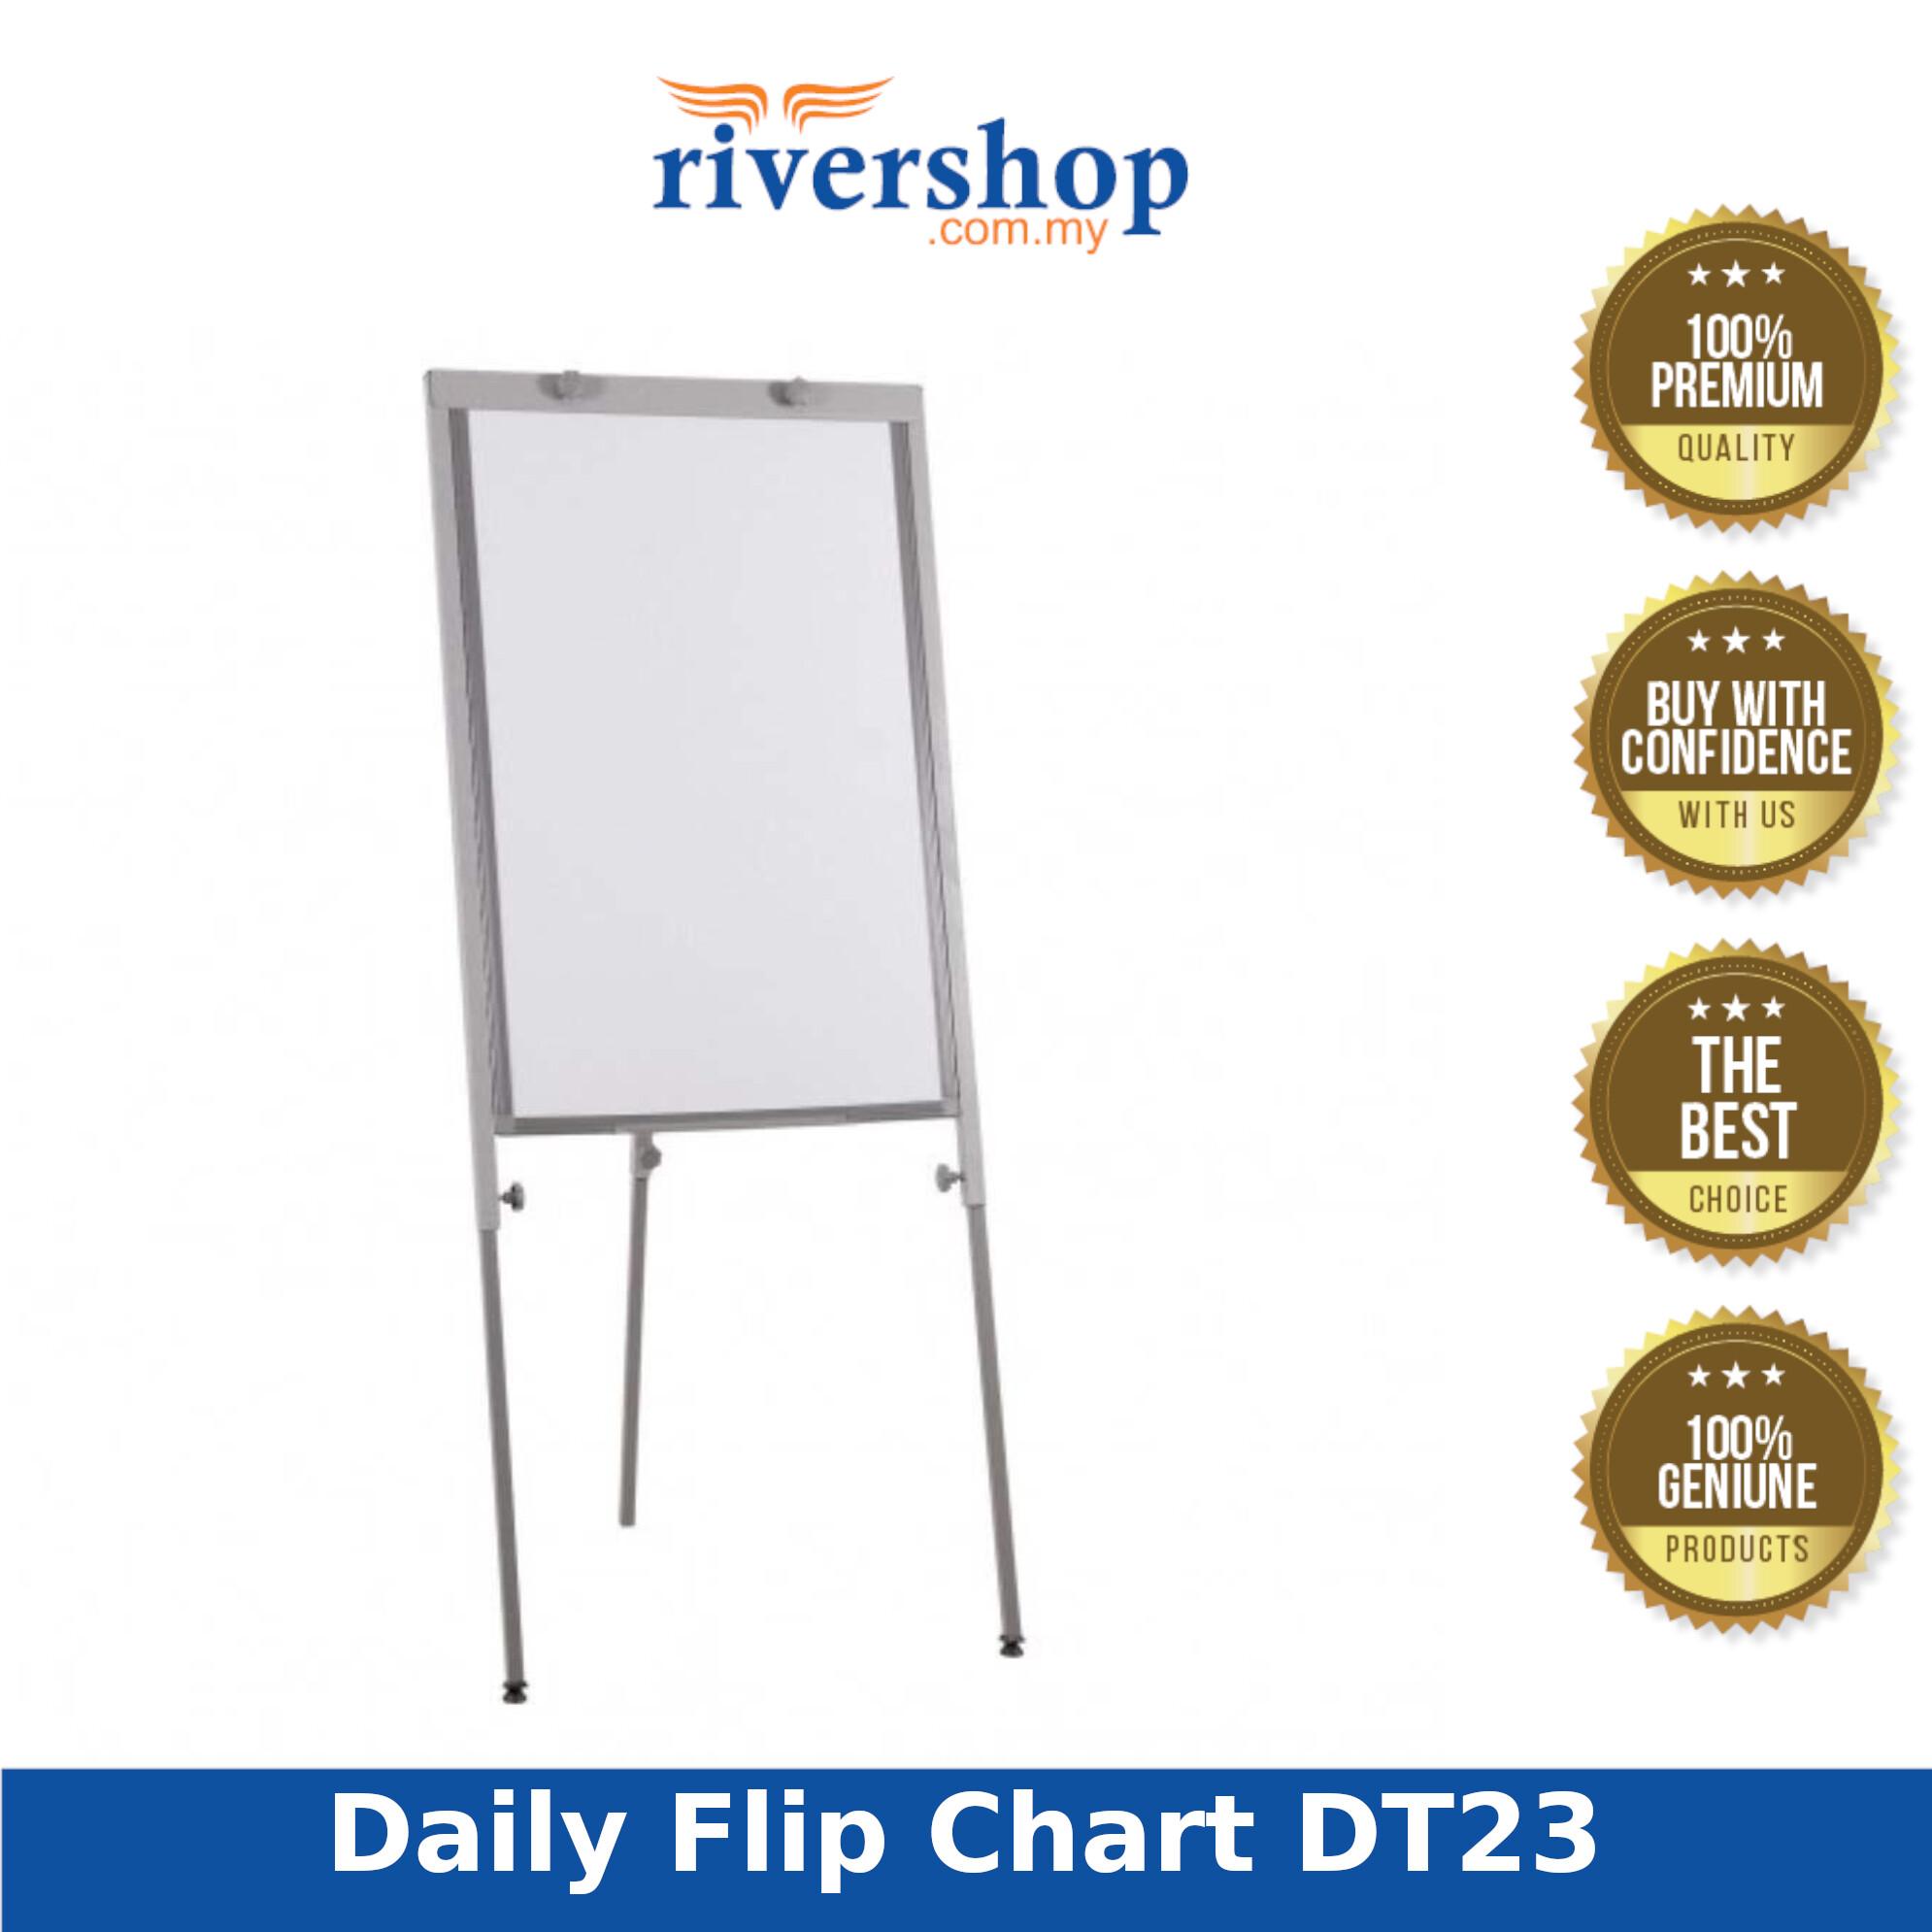 Daily Flip Chart DT23 - 105-191H x 65W x 56-97D (Item No: G05-56) A8R1B23